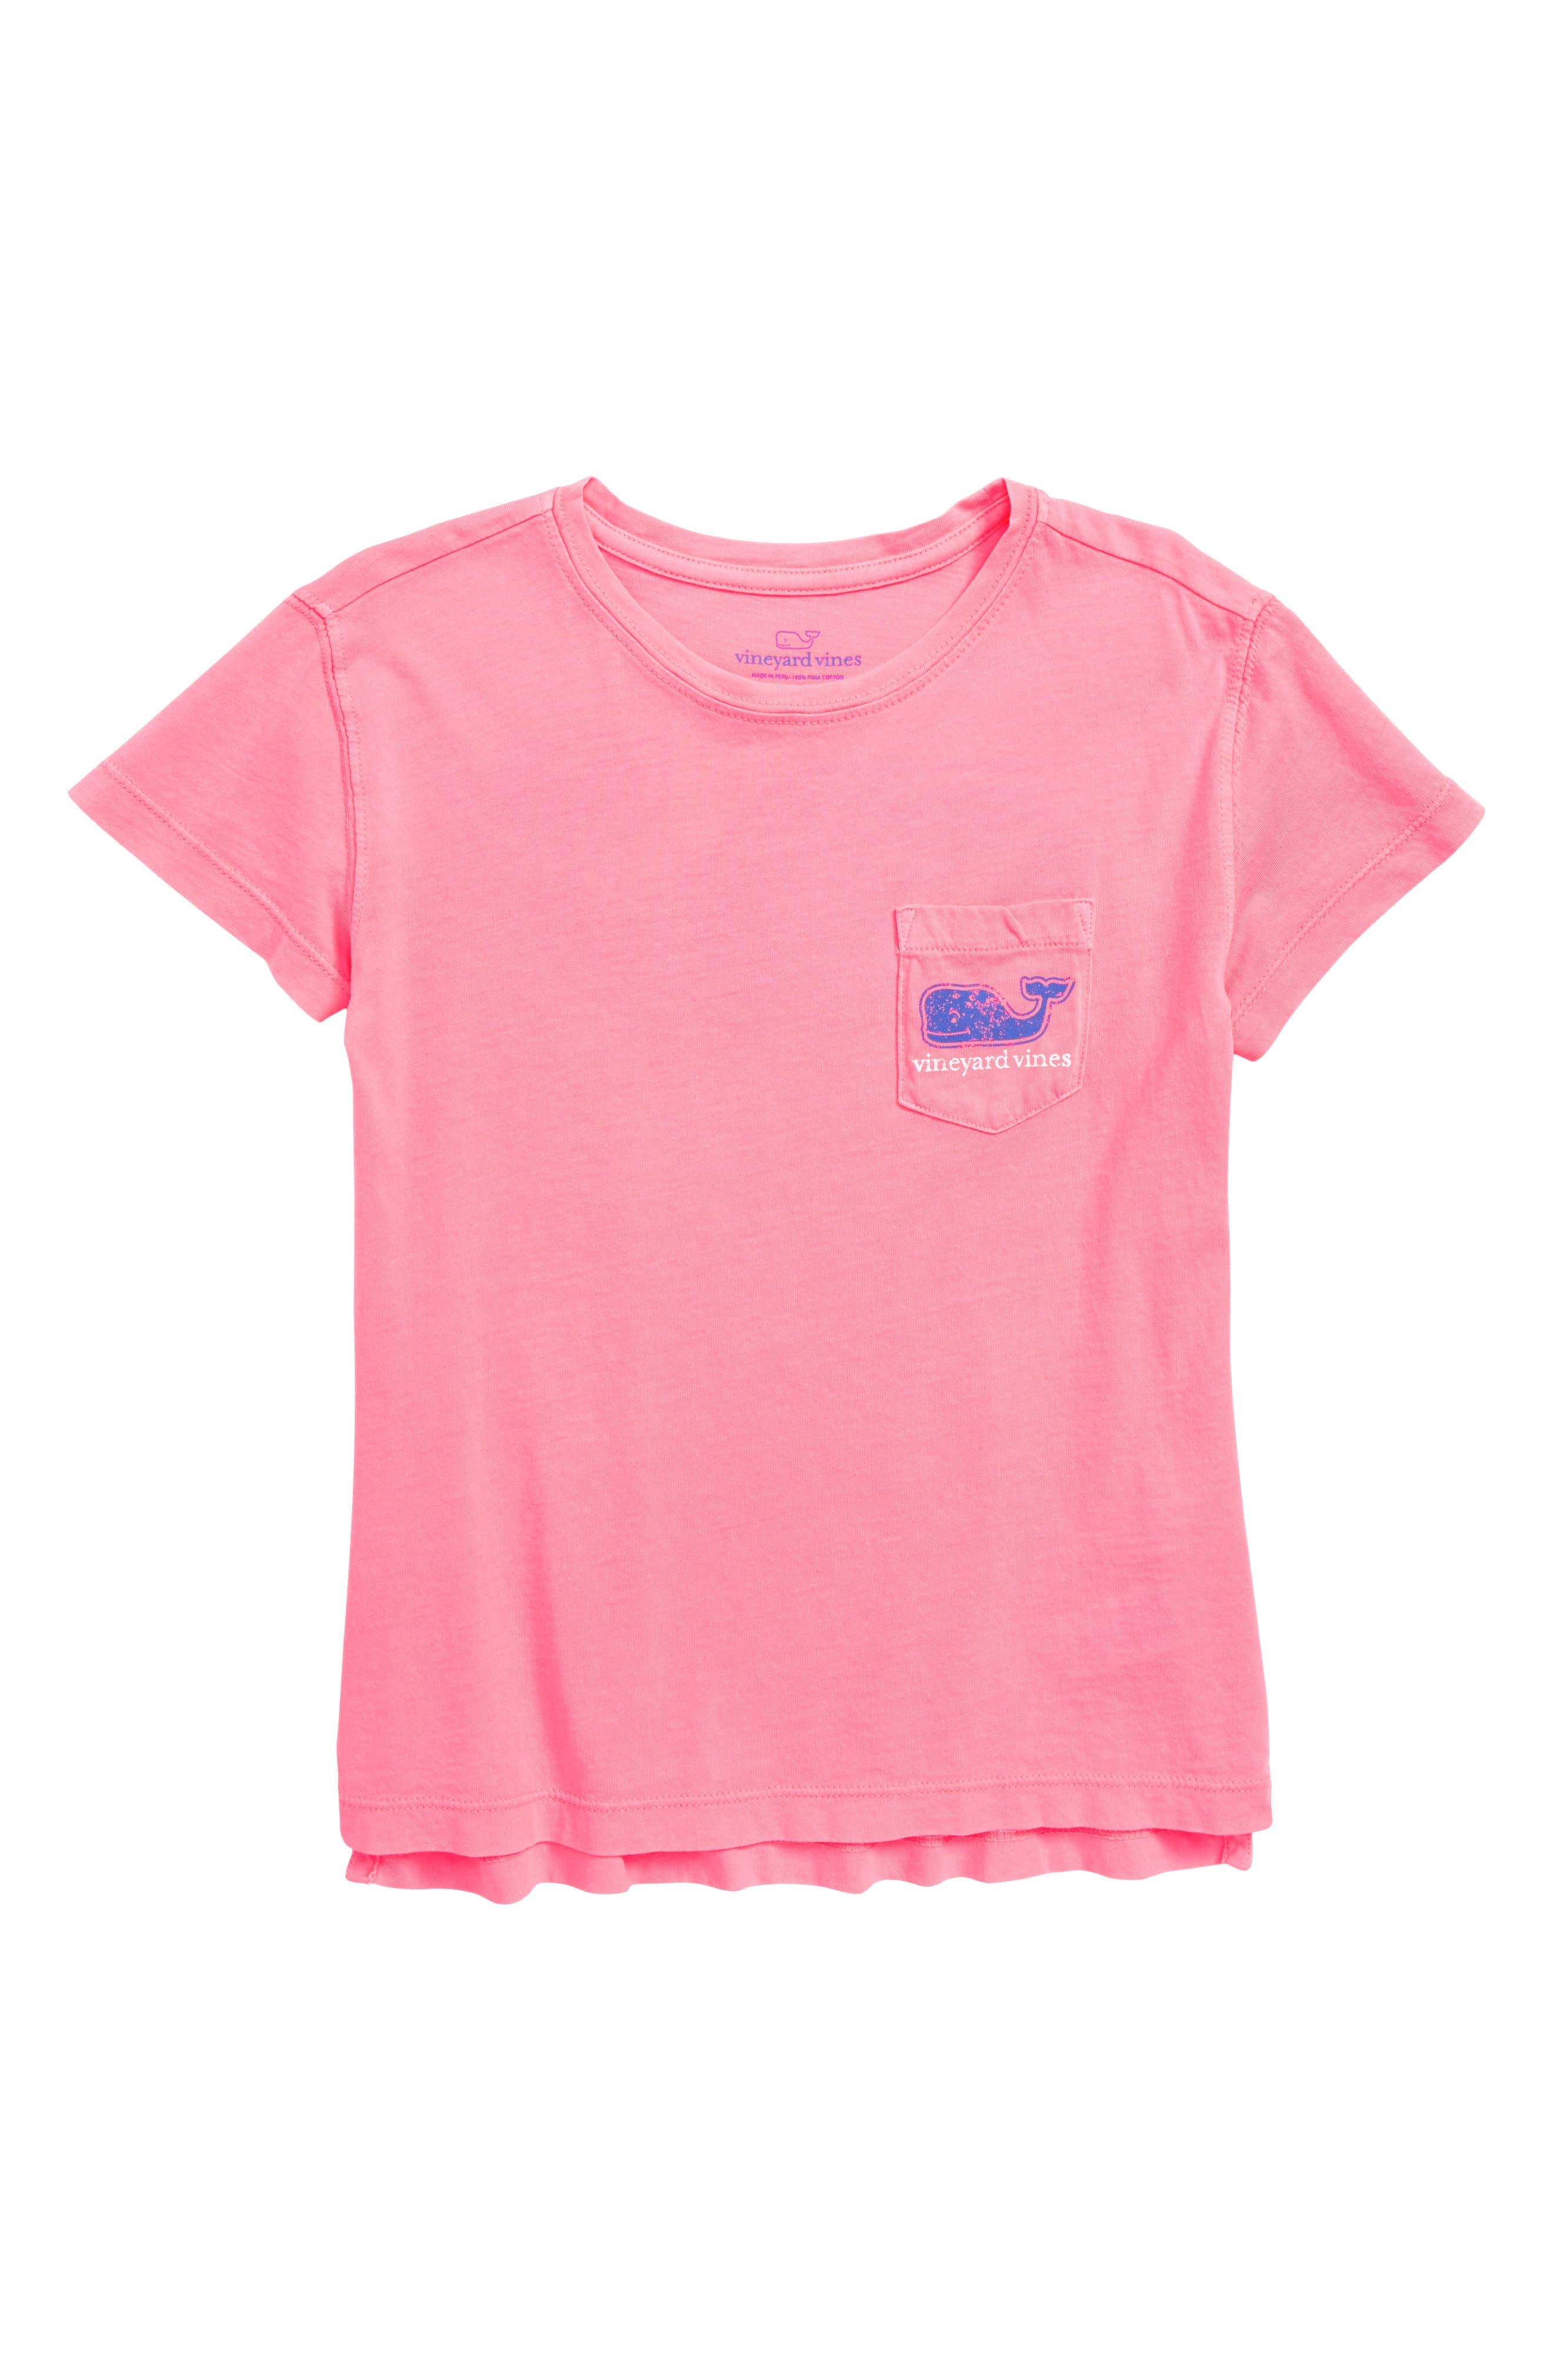 Vintage Whale Pocket Tee,                             Main thumbnail 1, color,                             Malibu Pink